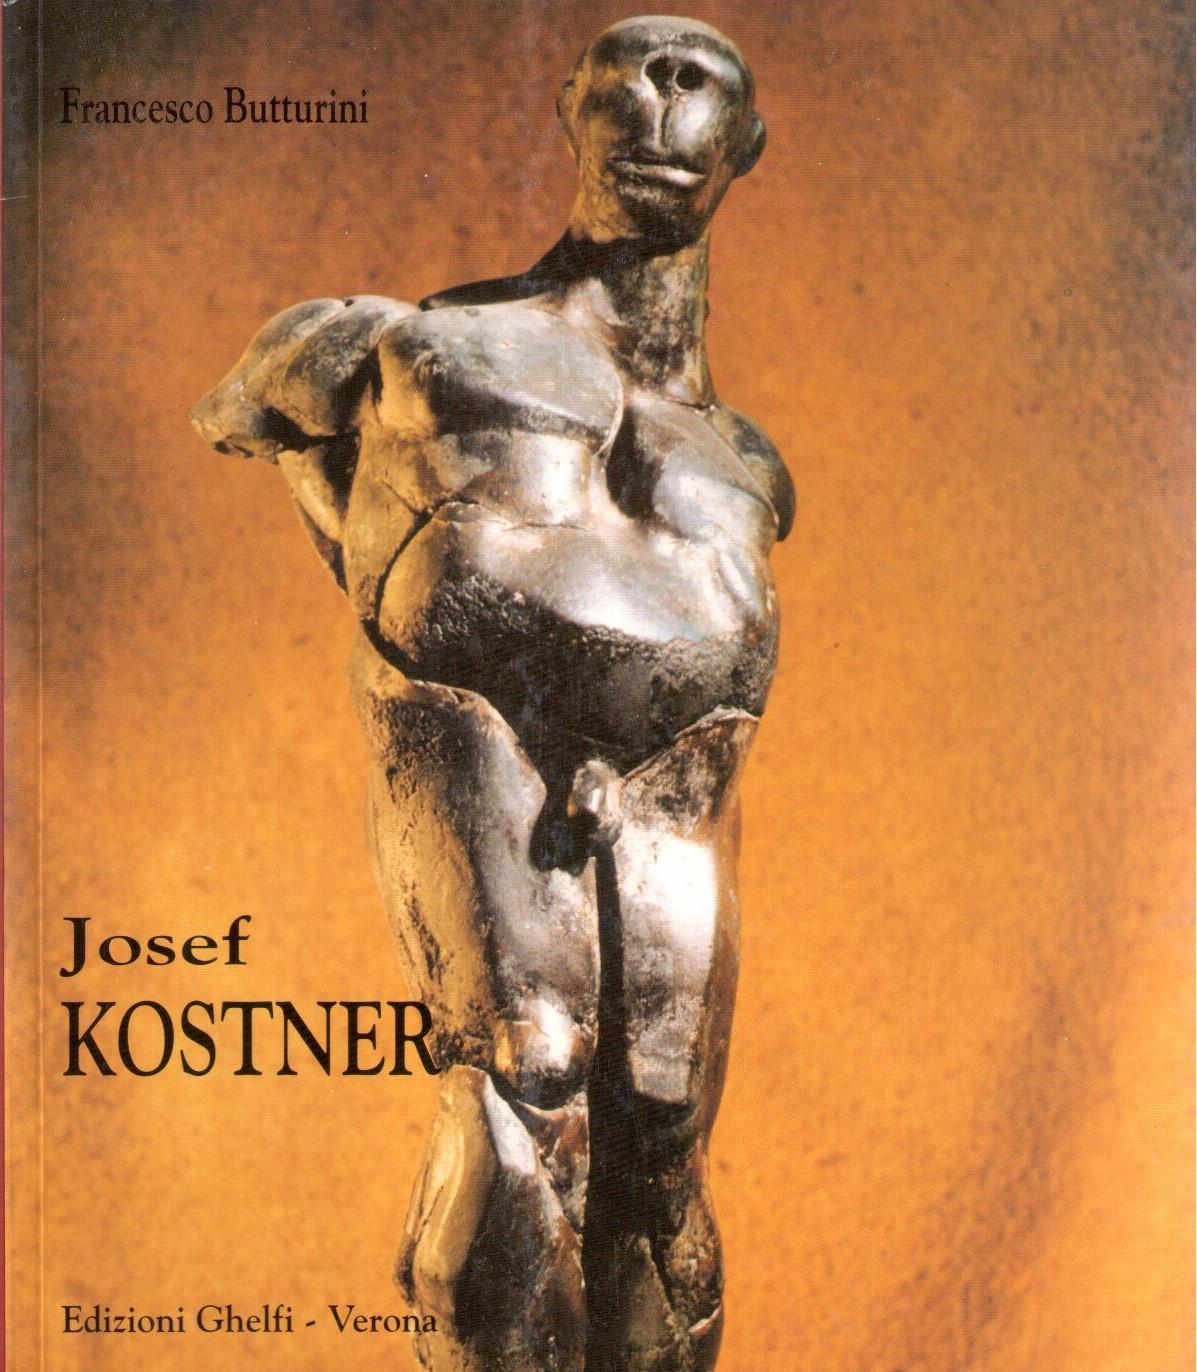 Josef Kostner, Francesco Butturini